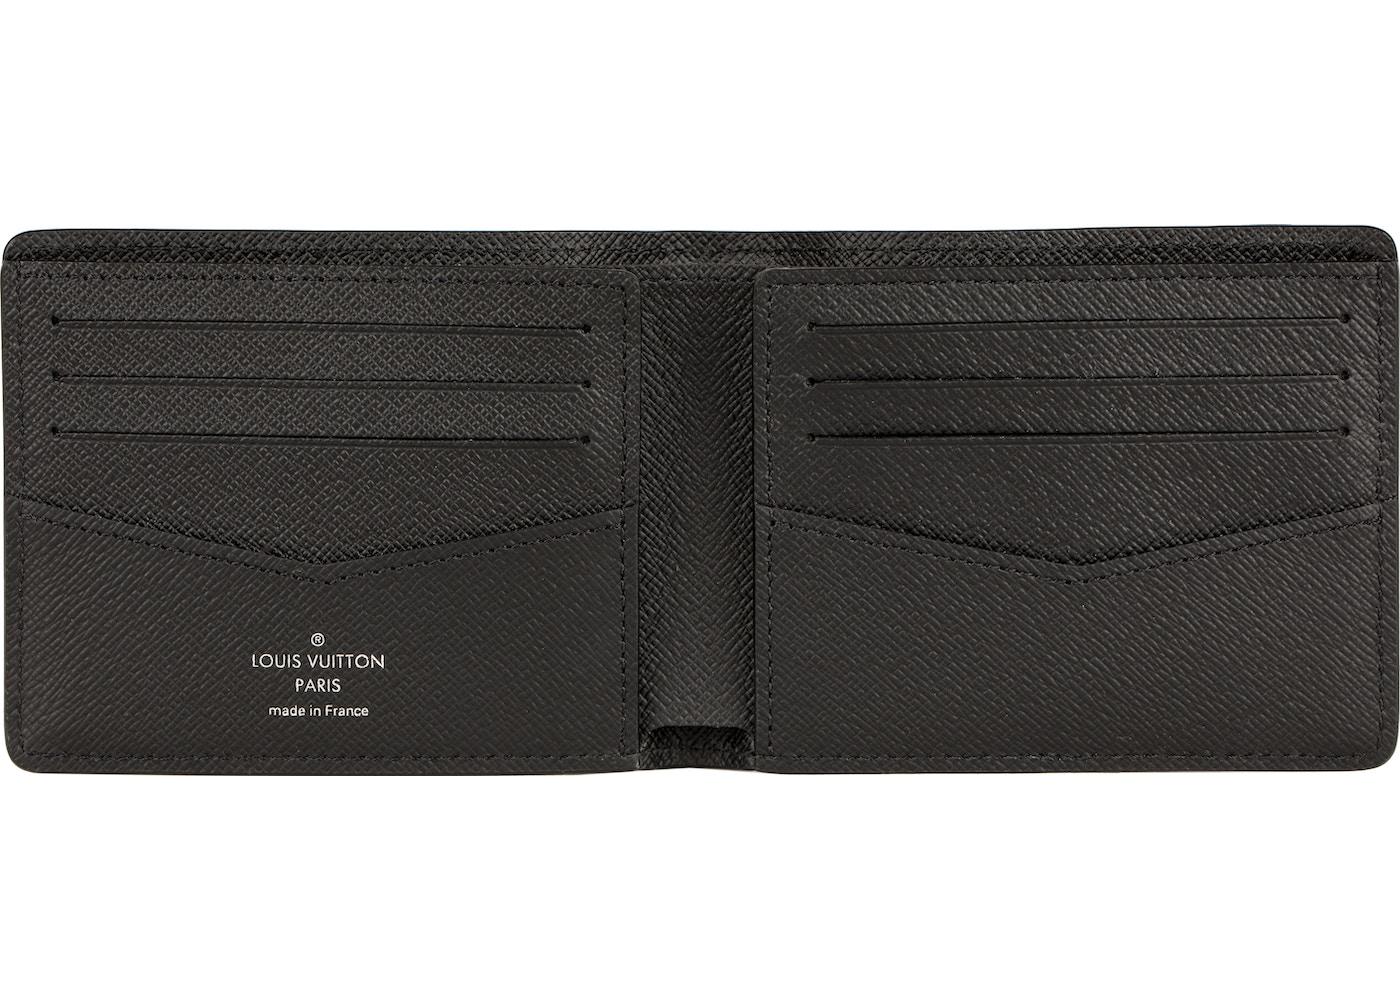 6d626e8d88a7 Louis Vuitton x Supreme Slender Wallet Epi Black